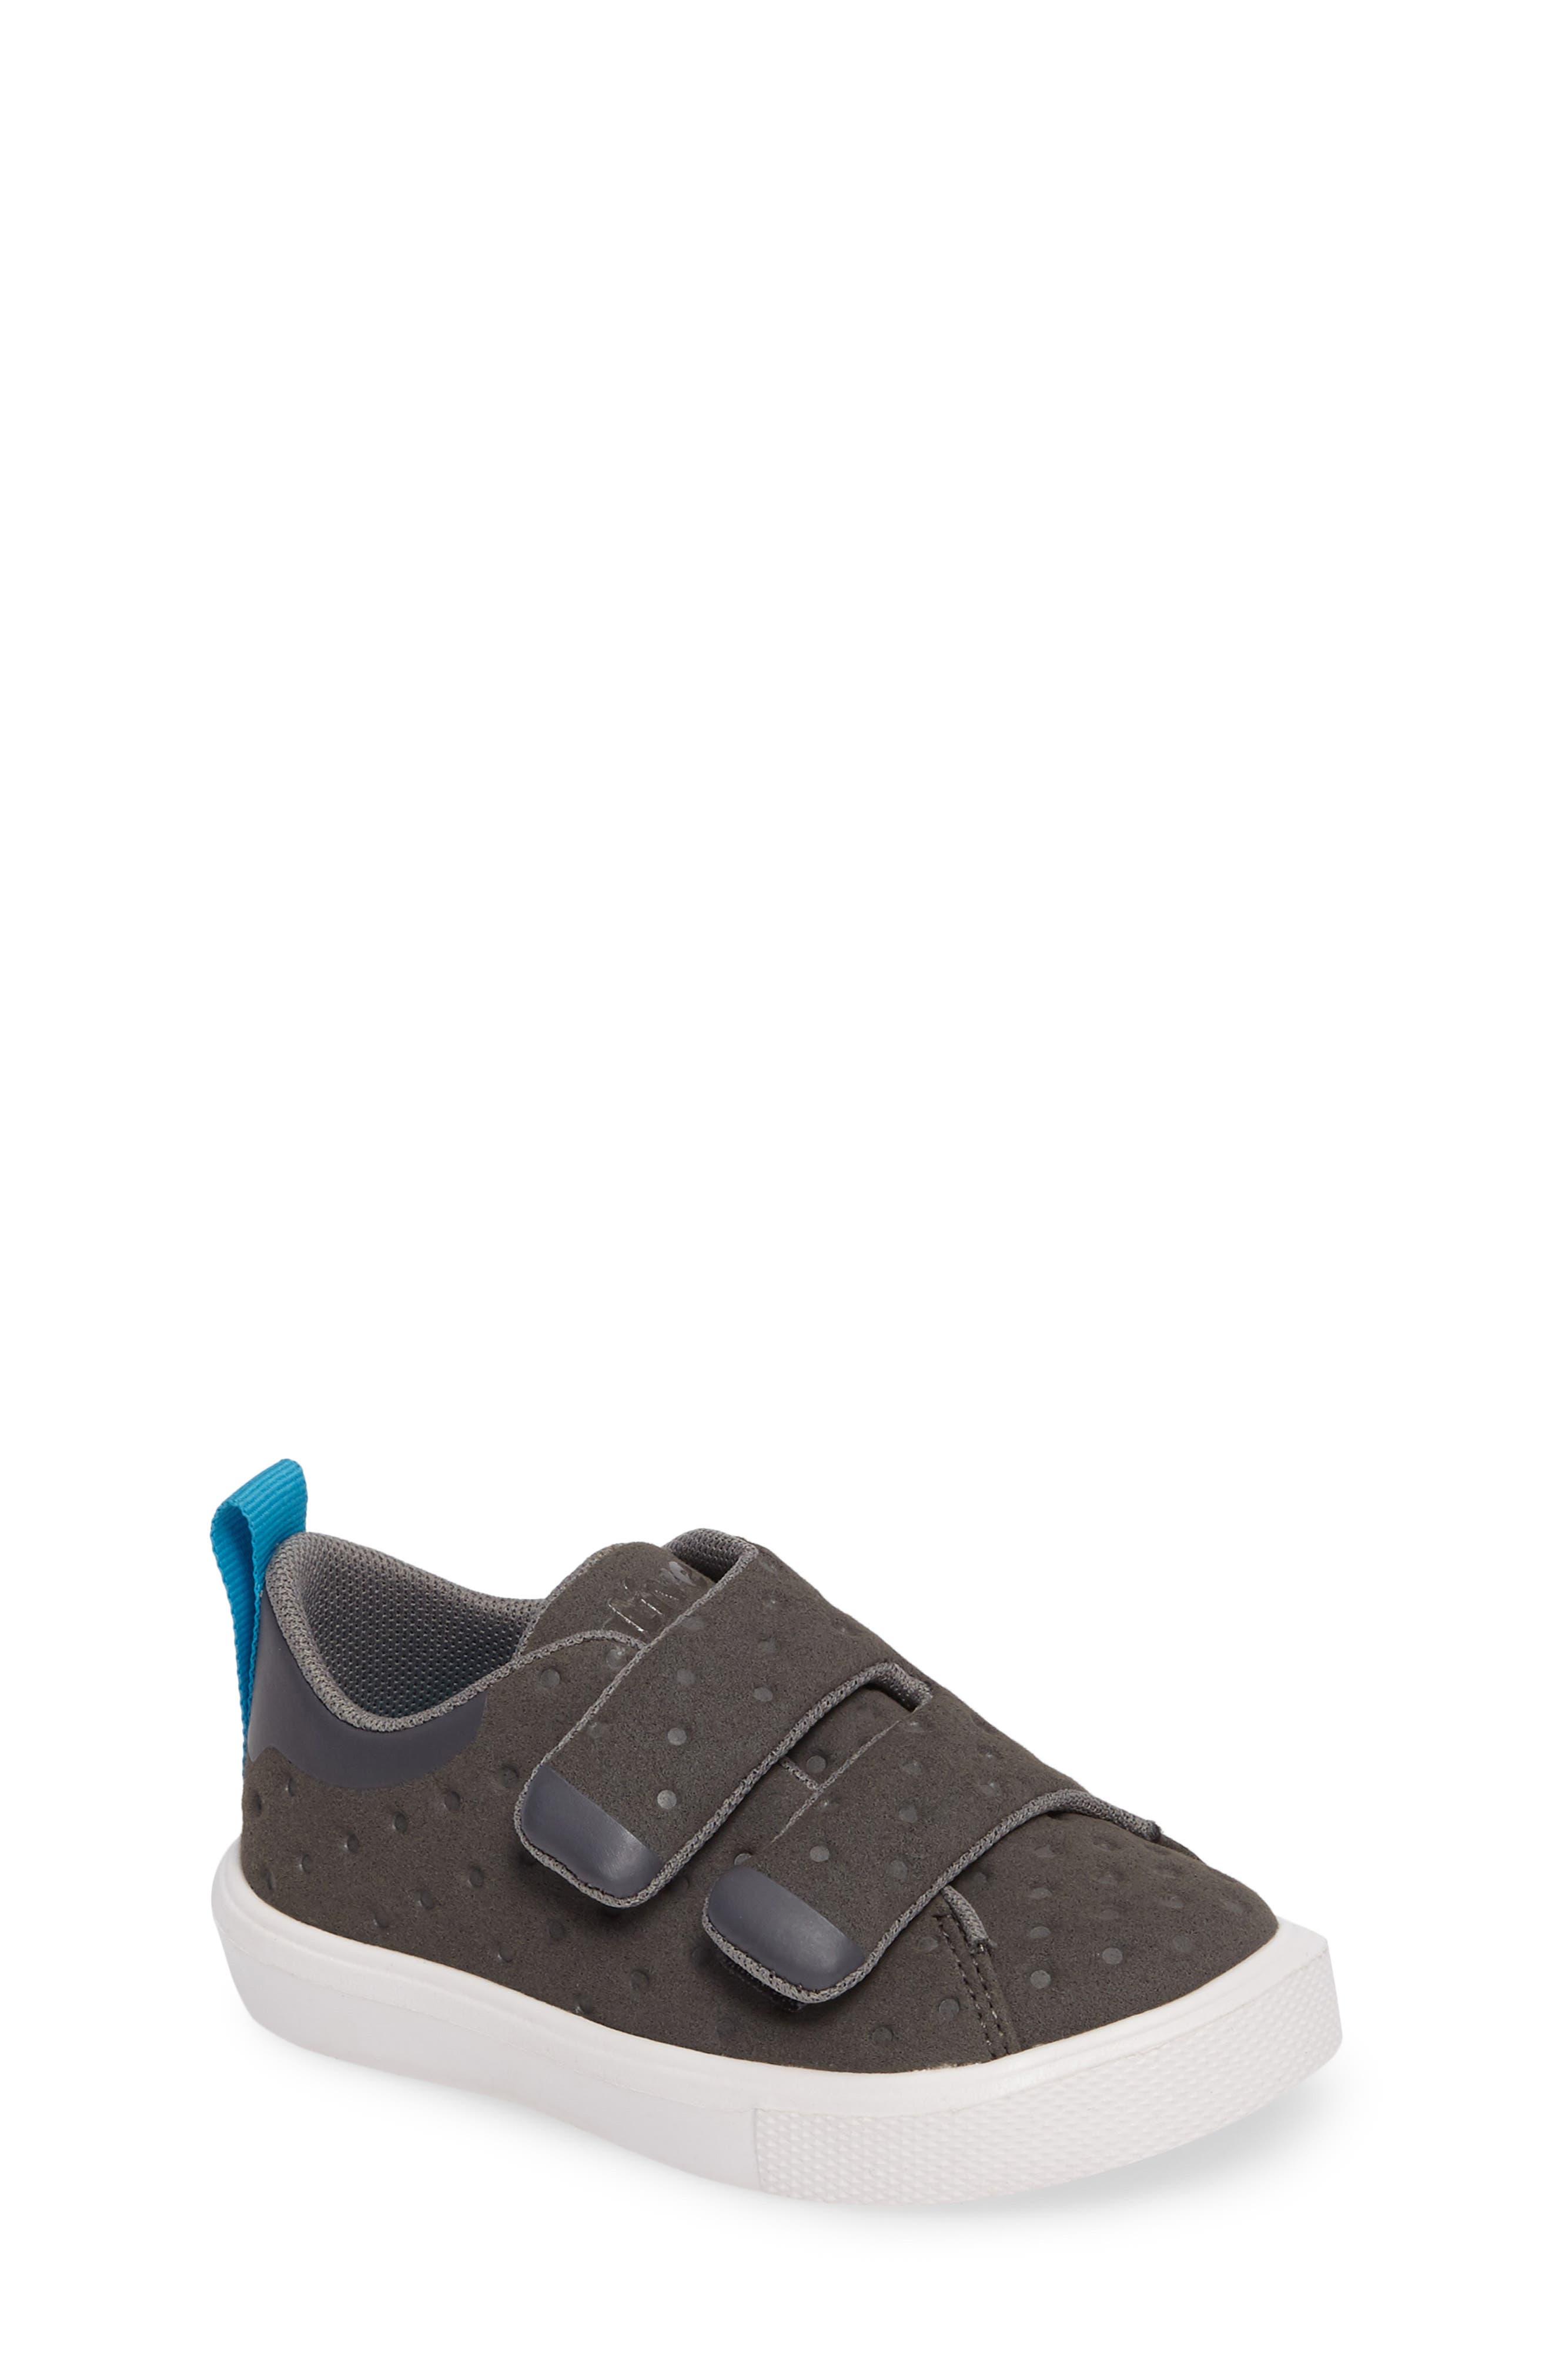 Monaco Sneaker,                         Main,                         color, Dublin Grey/ Shell White